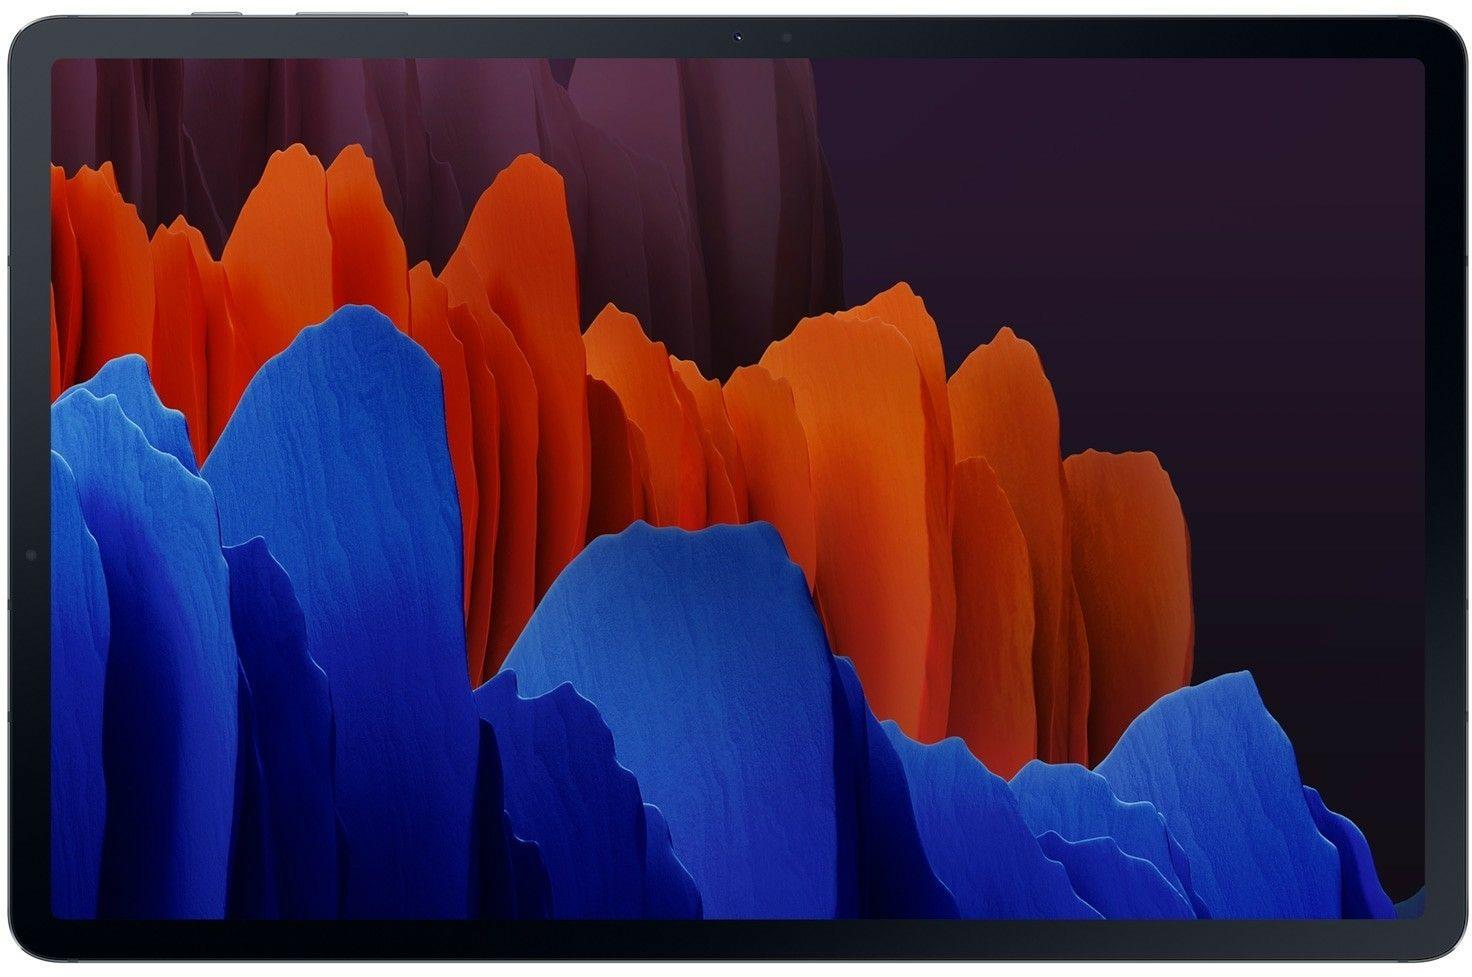 Samsung Galaxy Tab S7 Plus 5G 256GB im O2 Unlimited Max oder Free L Boost | Vodafone | Telekom Young